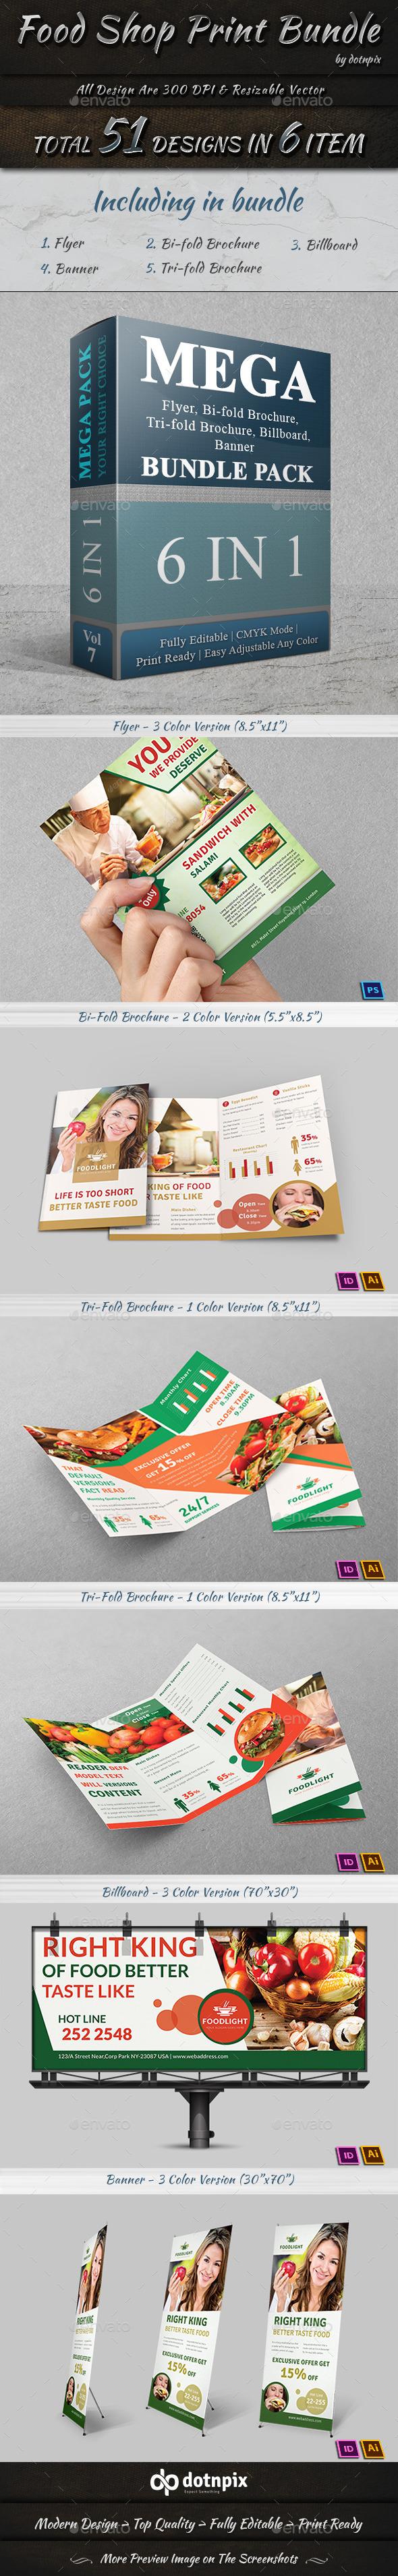 GraphicRiver Food Shop Print Bundle 10200153